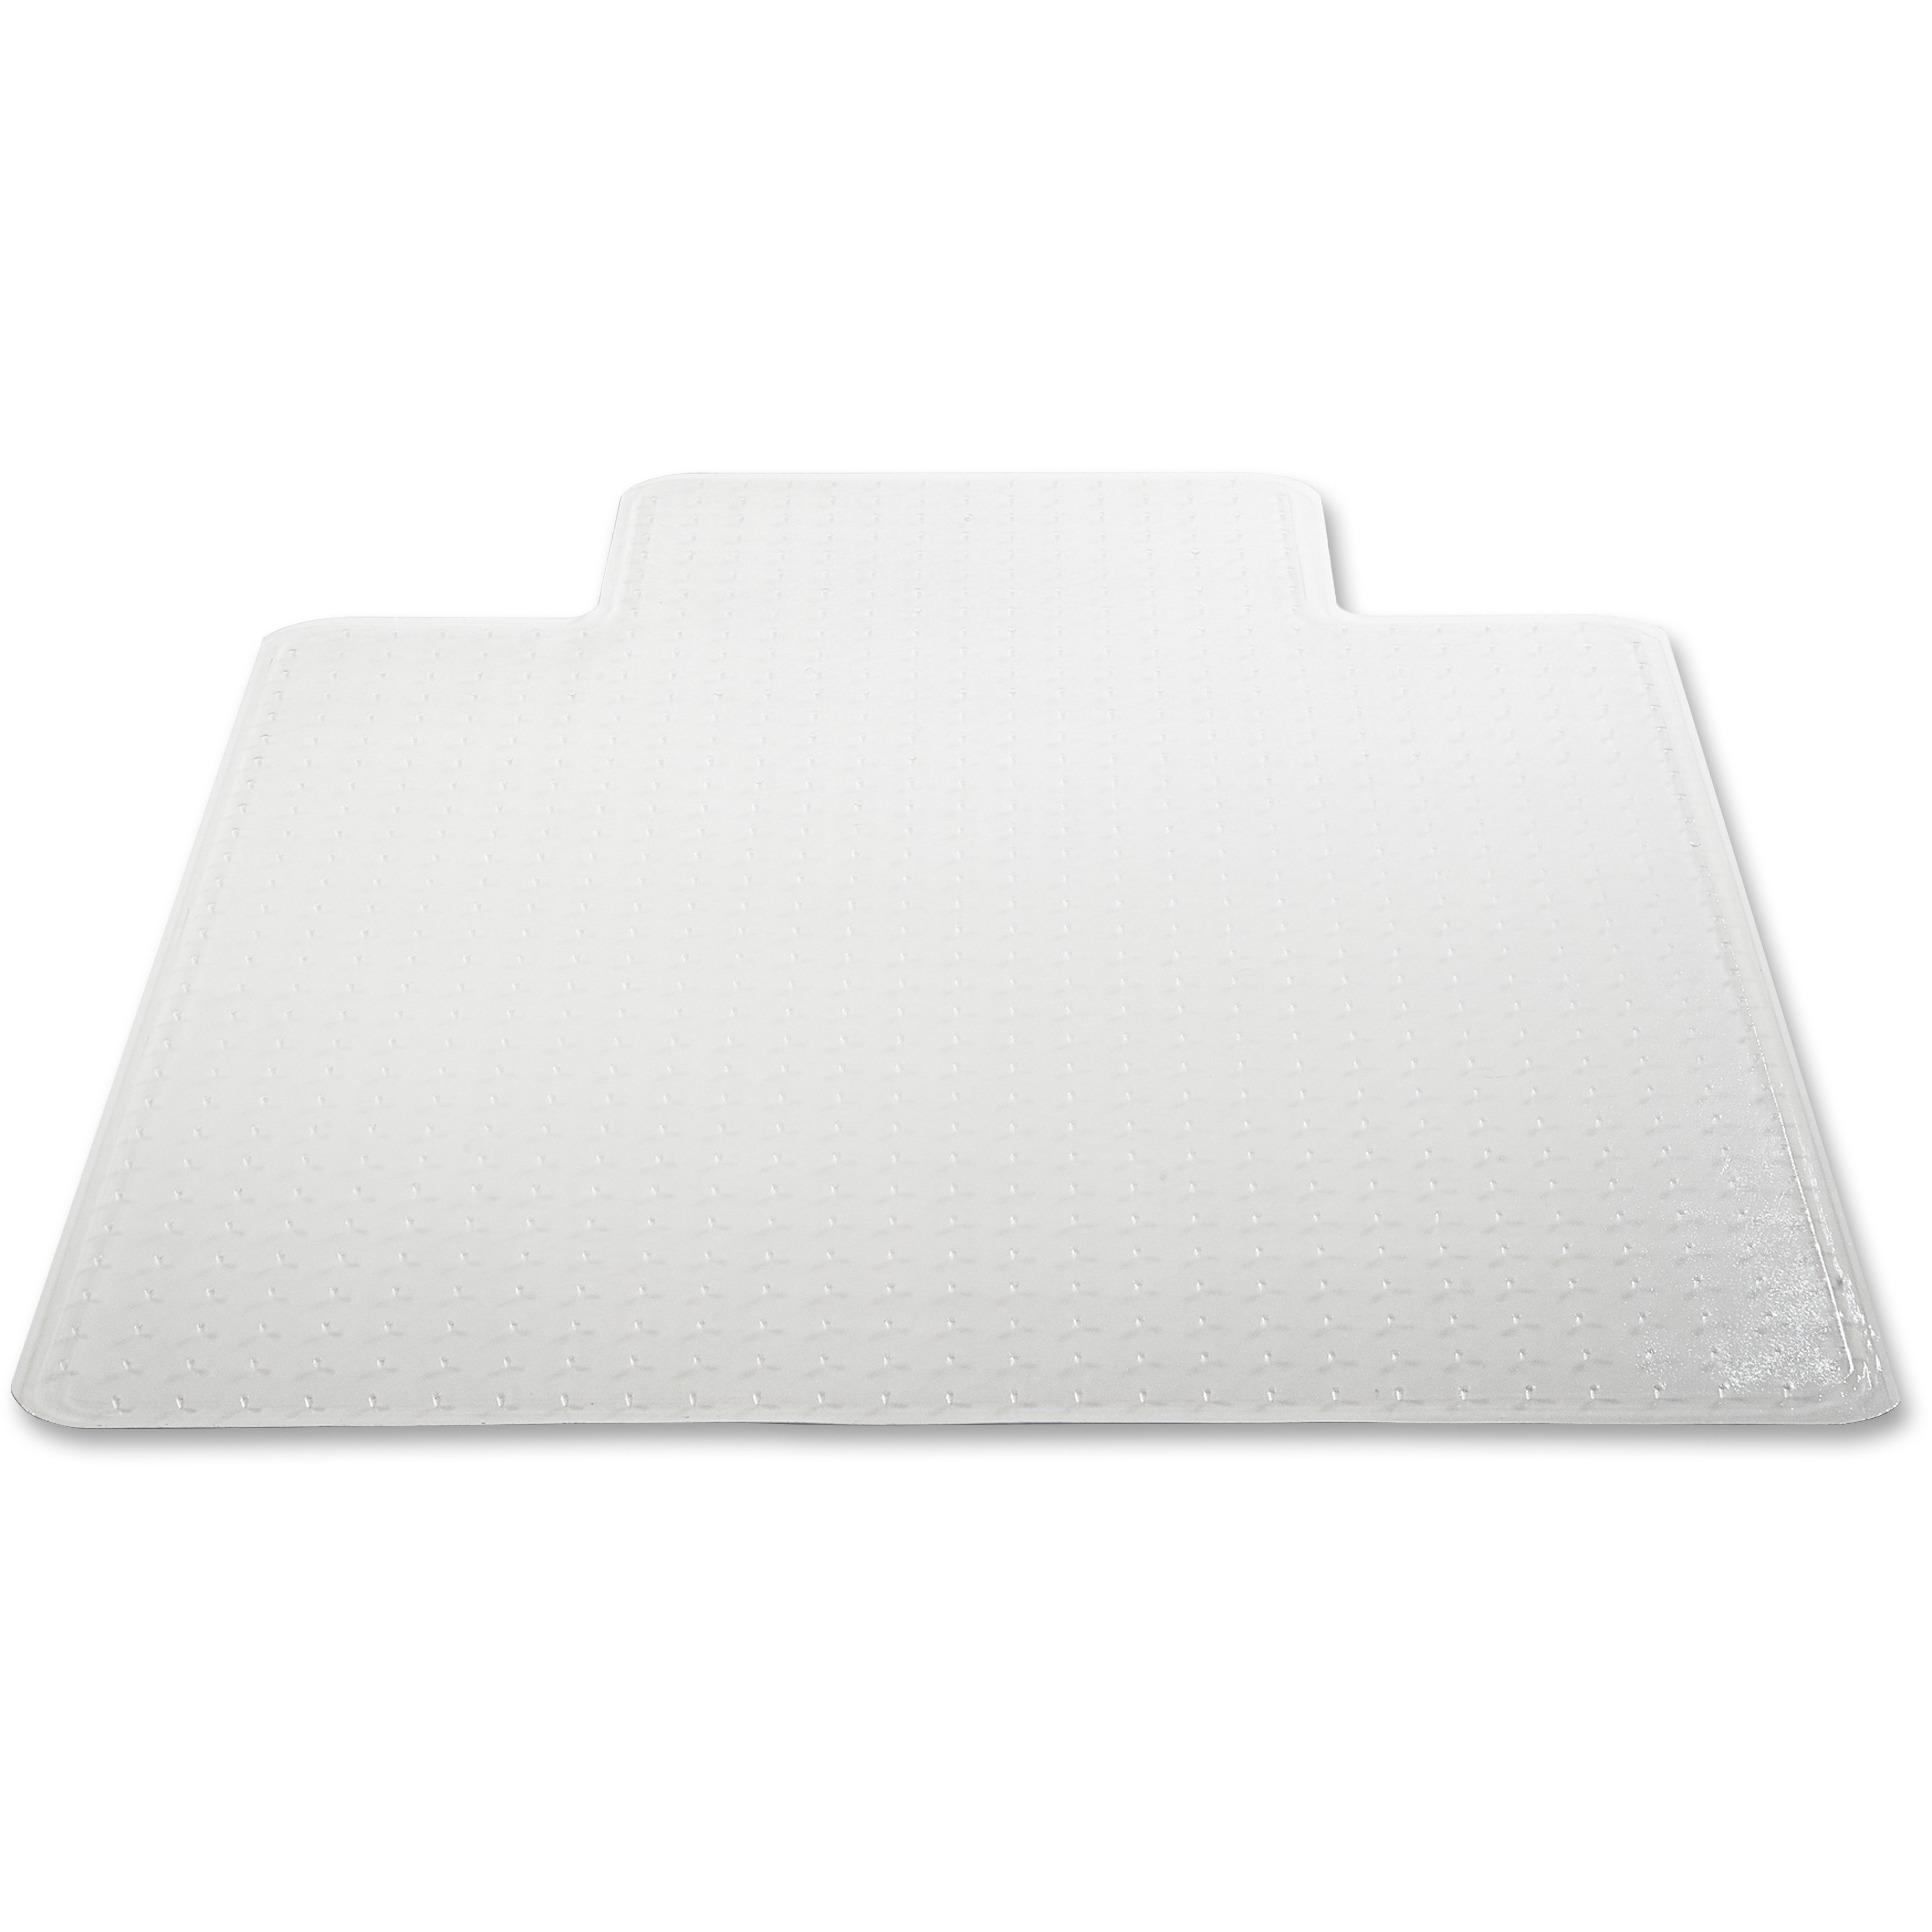 Deflecto Durmat For Carpet Carpeted Floor 48 Quot Length X